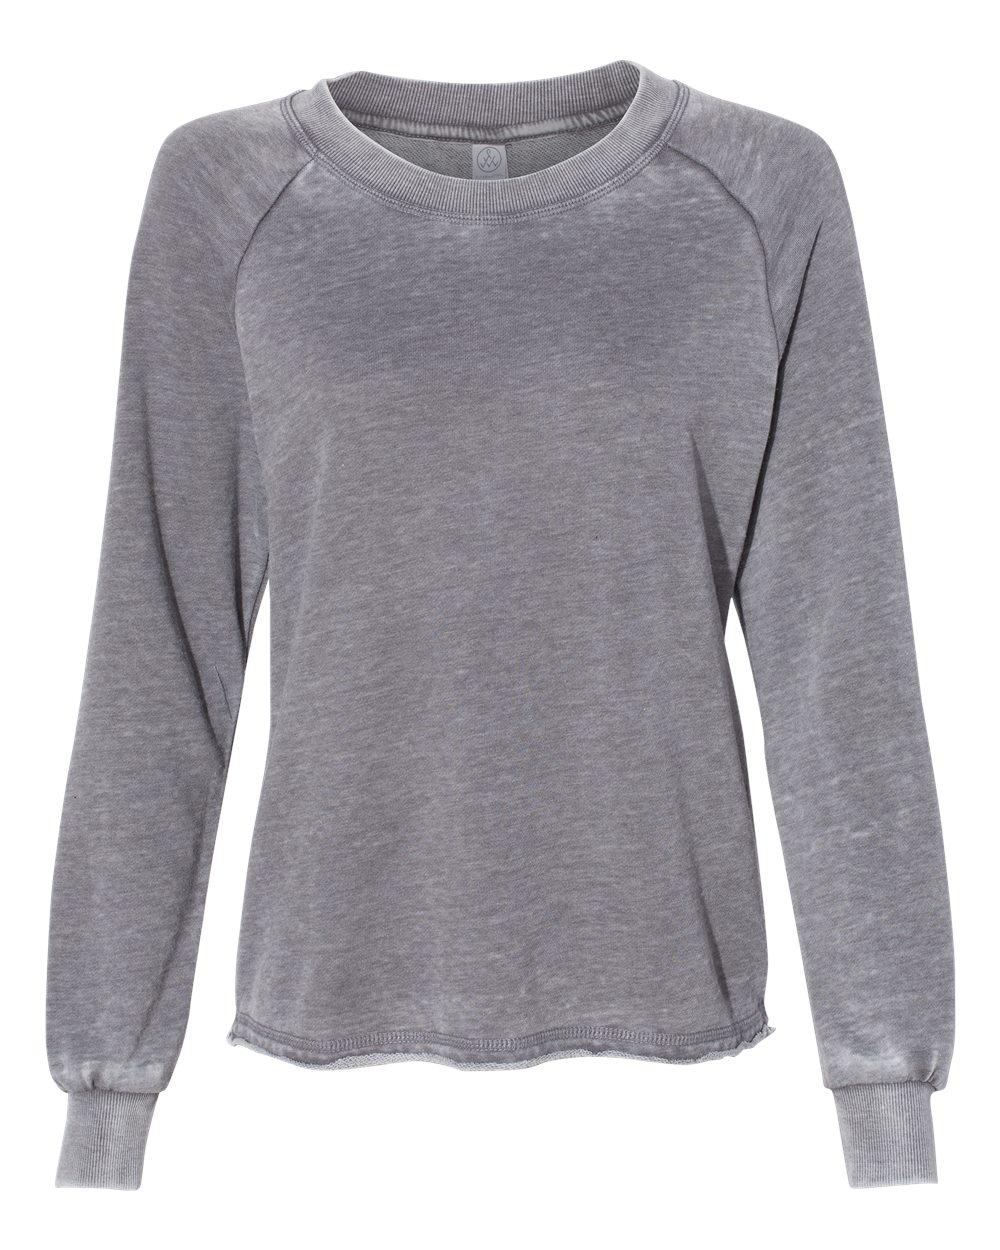 Alternative-Women-s-Lazy-Day-Burnout-French-Terry-LightSweatshirt-8626-up-to-XL thumbnail 9